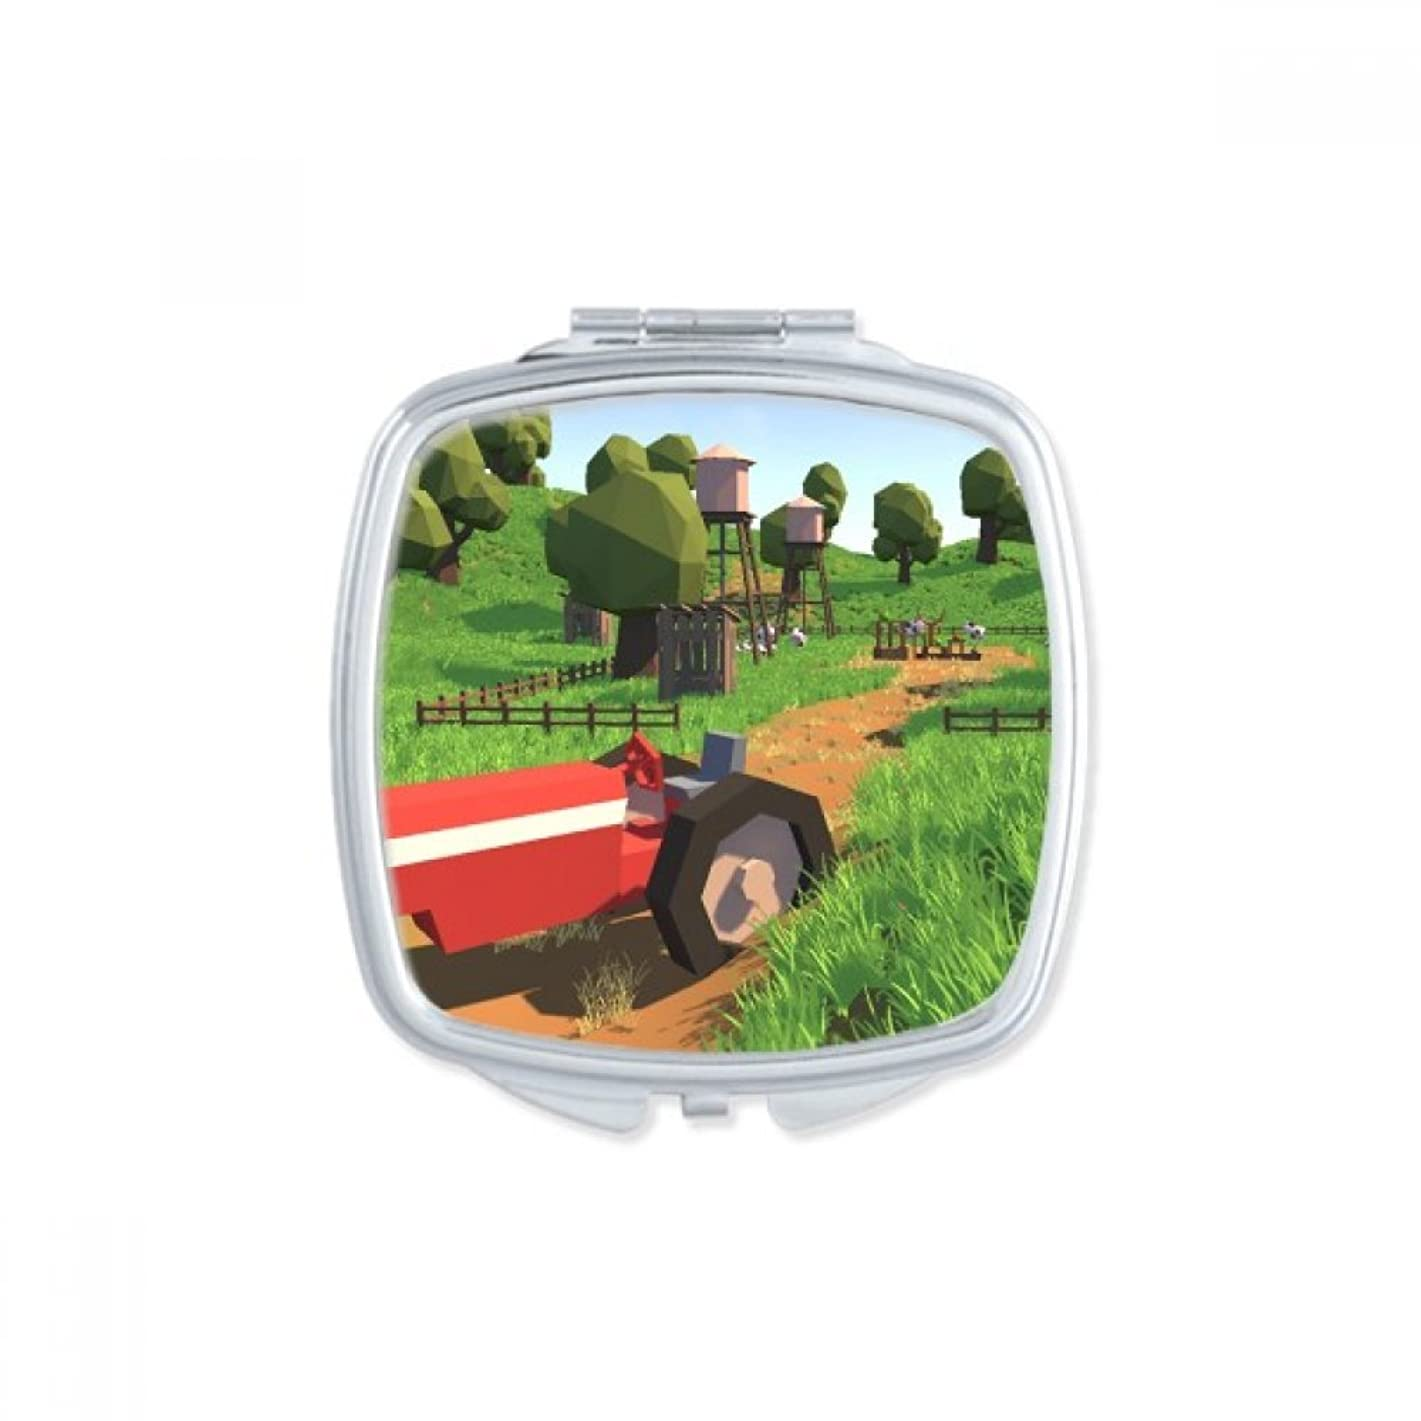 Farm Game Truck Scene Square Compact Makeup Pocket Mirror Portable Cute Small Hand Mirrors Gift